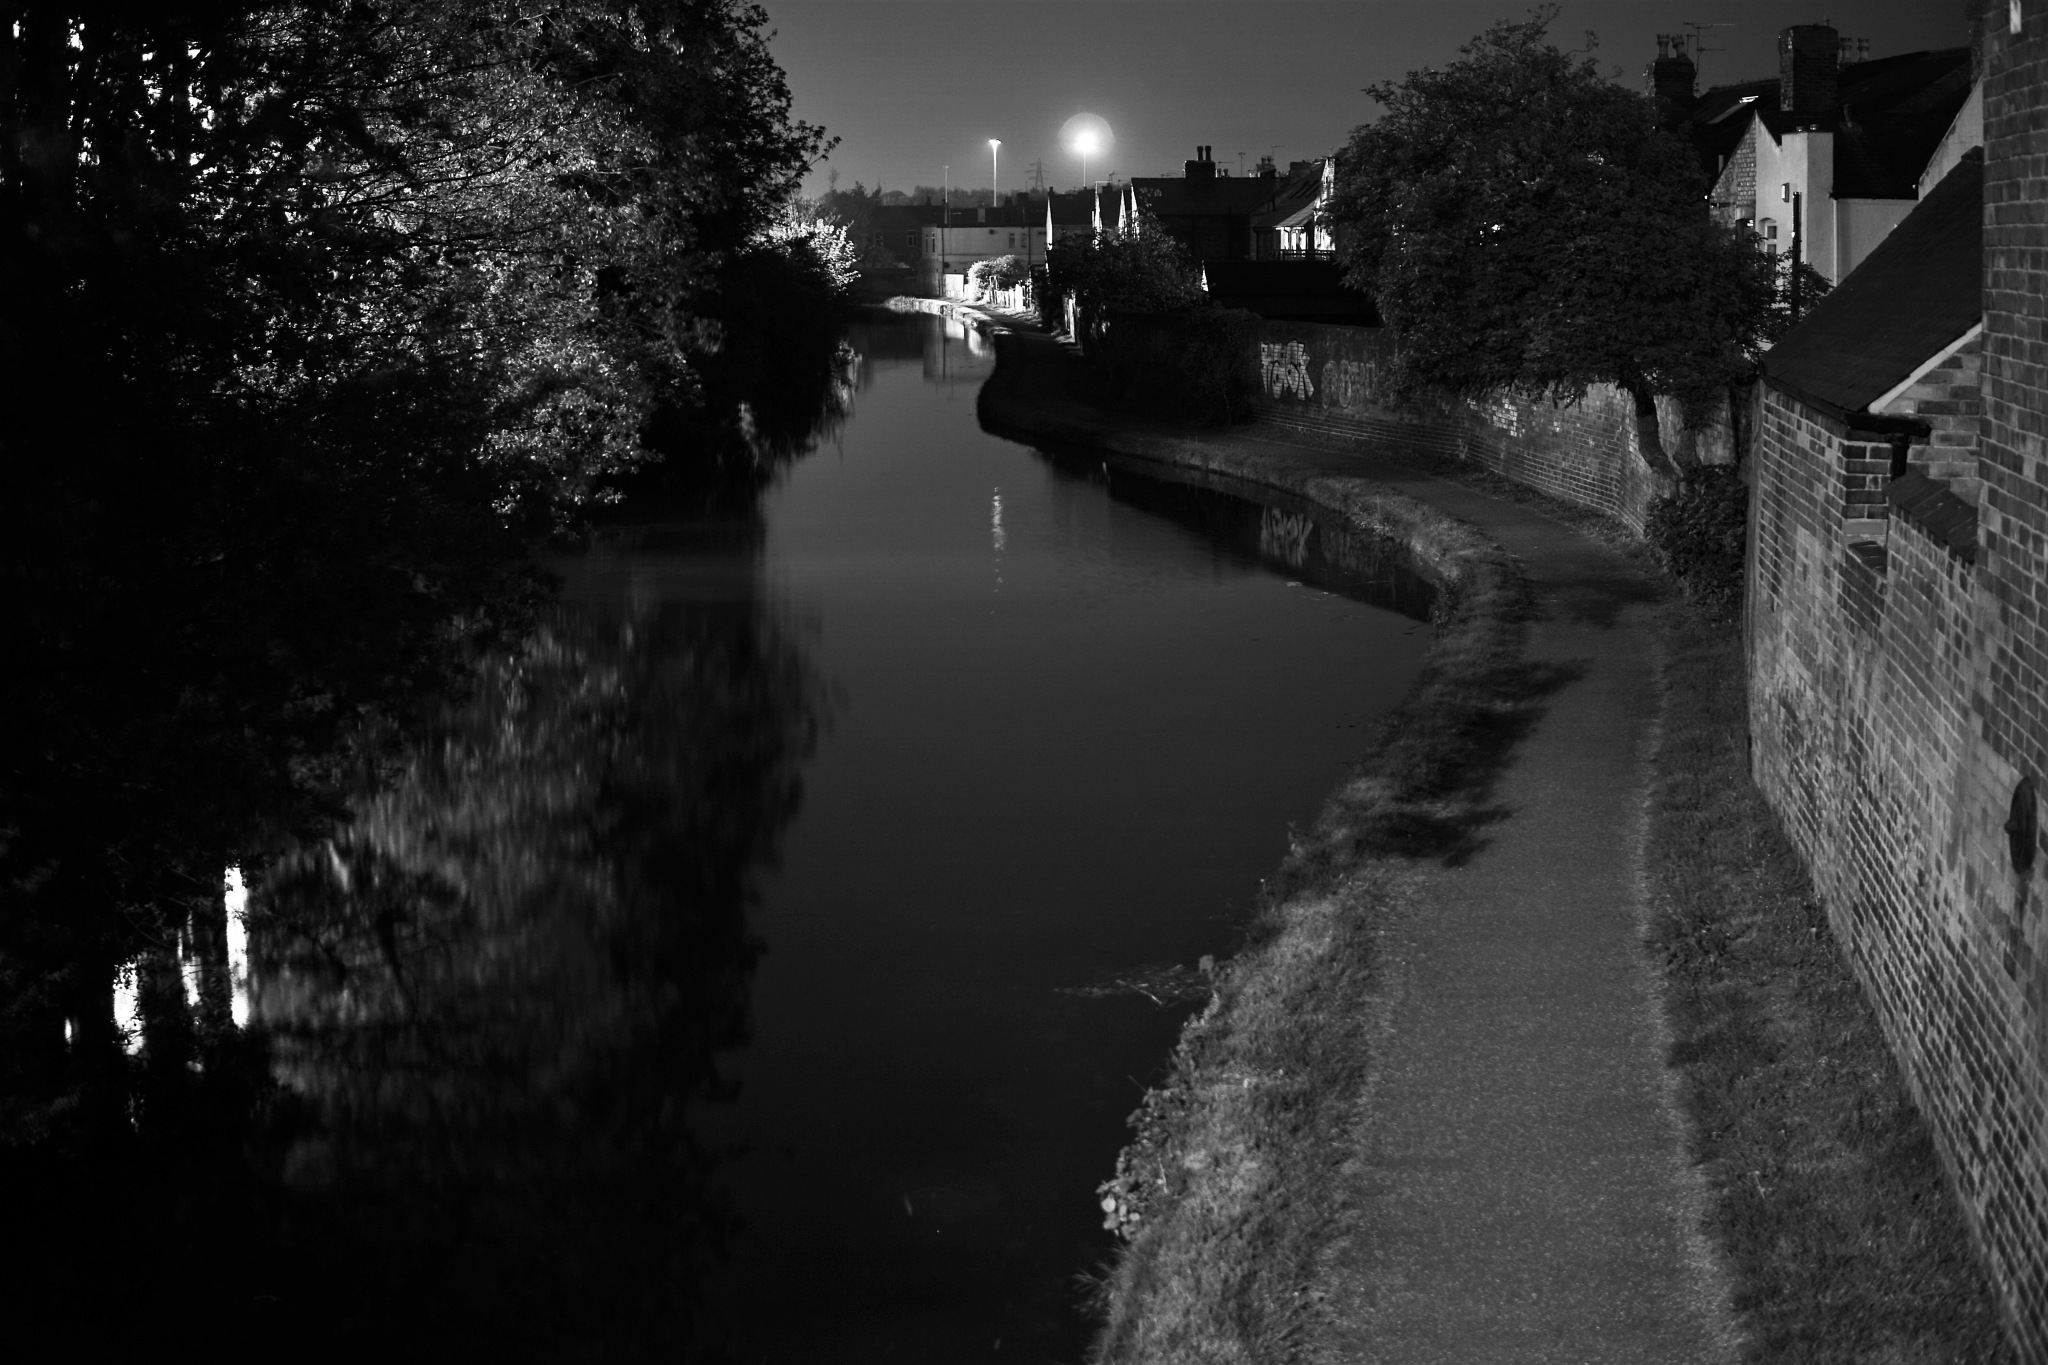 Night canal by AJ Yakstrangler Andy Jamieson